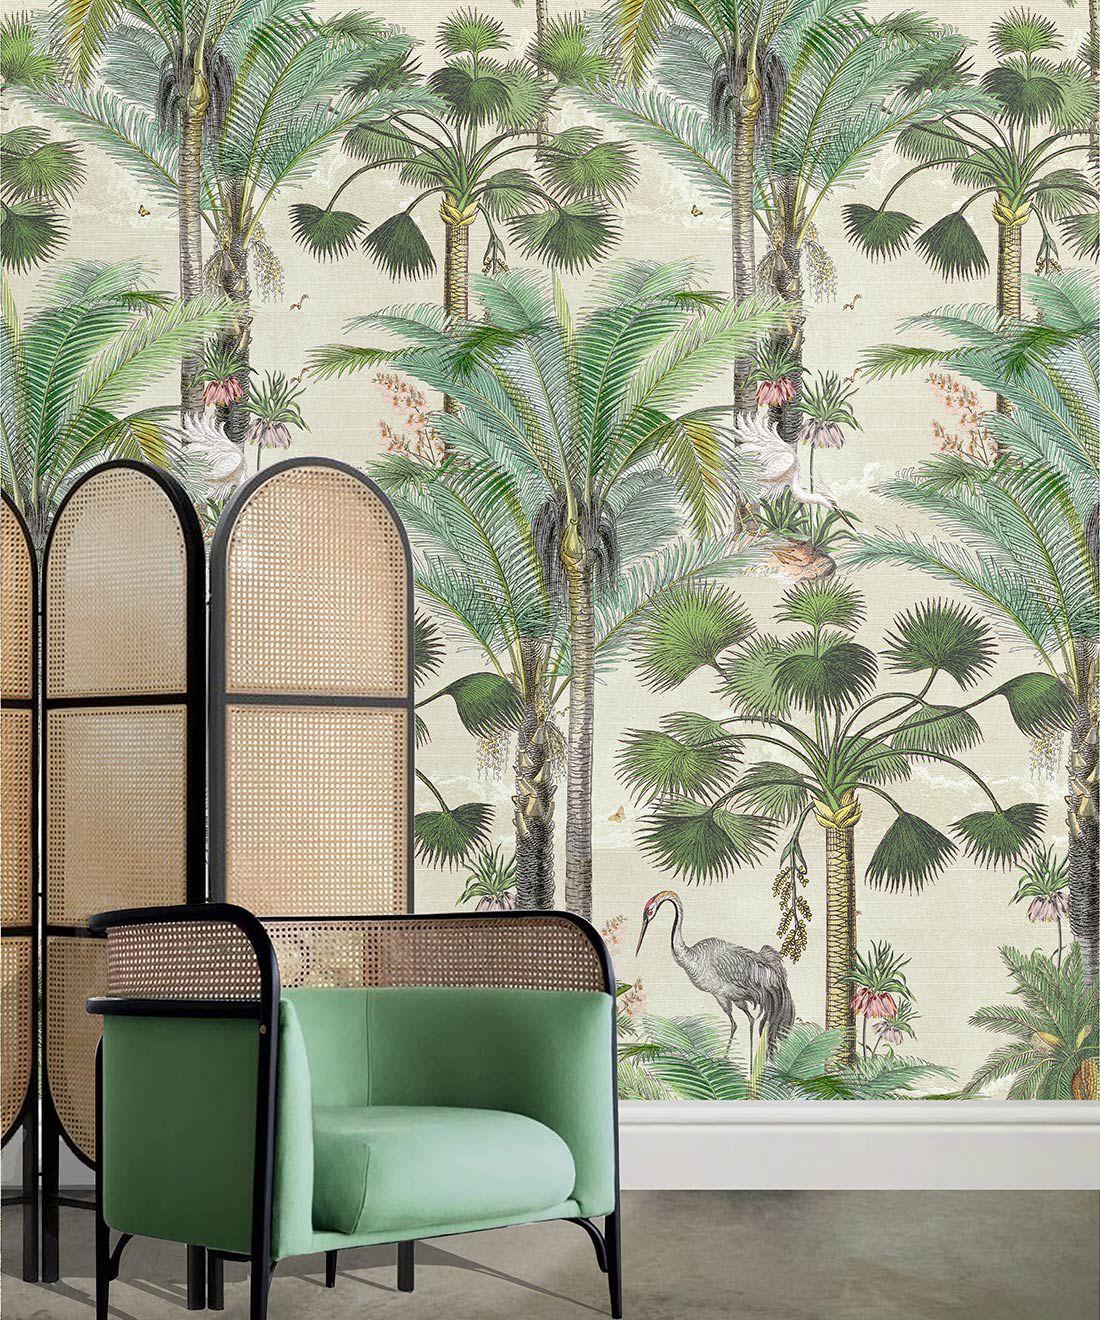 Kerala Palms Wallpaper Mural •Bethany Linz • Palm Tree Mural • Beige • Insitu